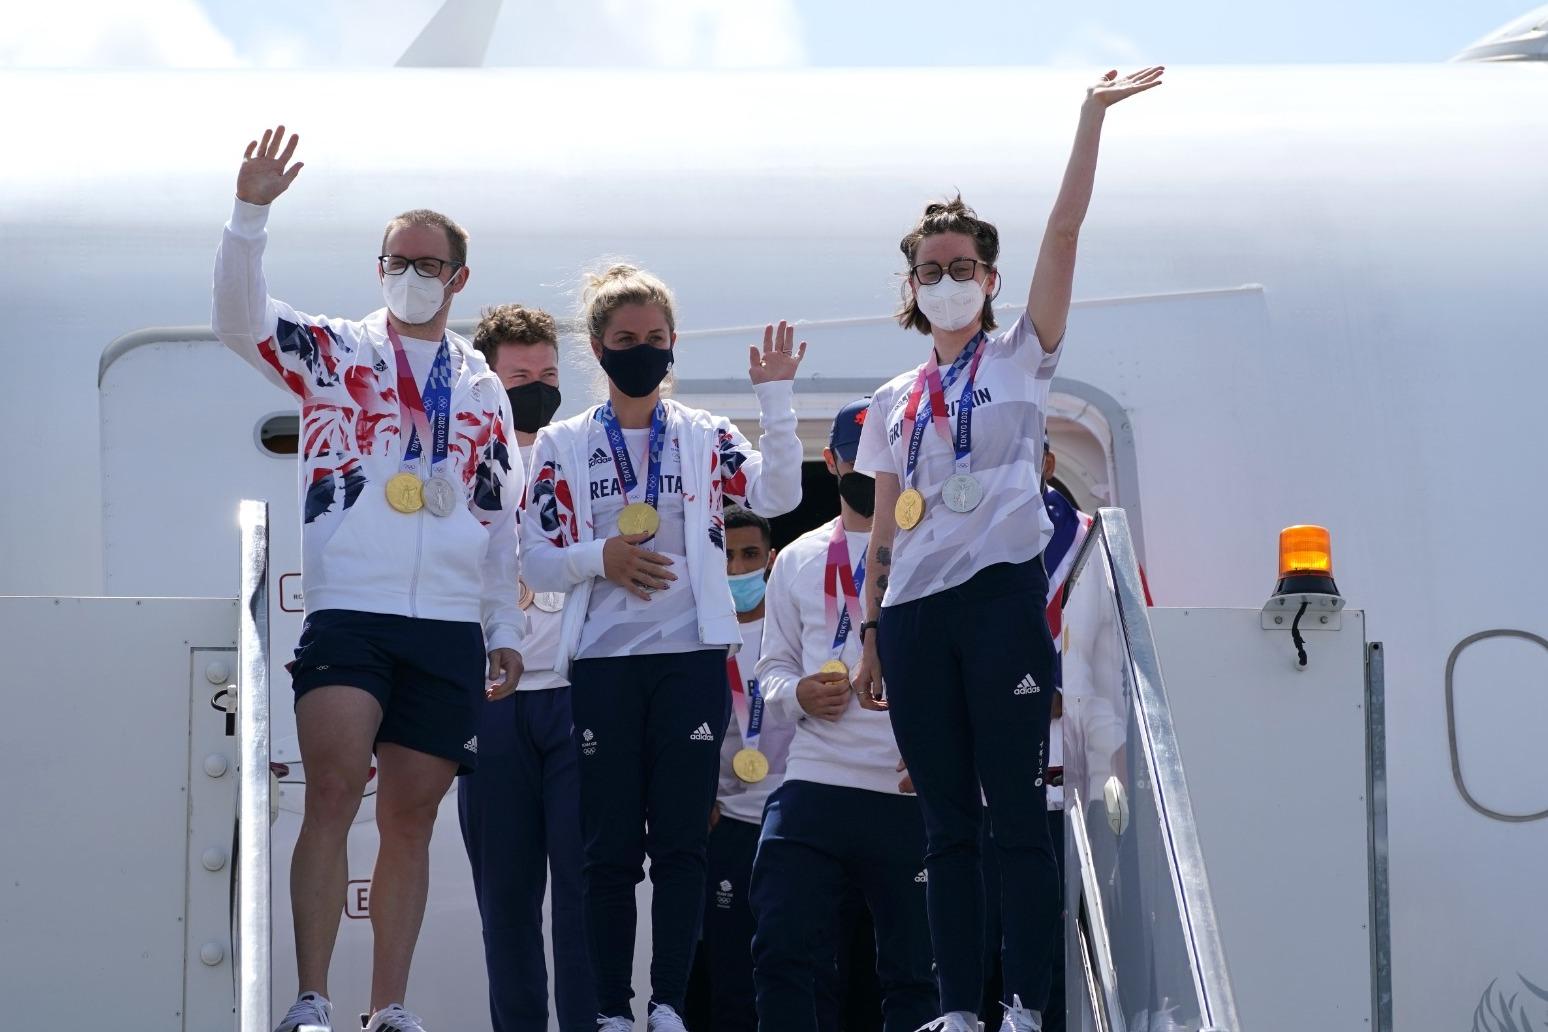 Queen sends 'warmest congratulations' to Team GB